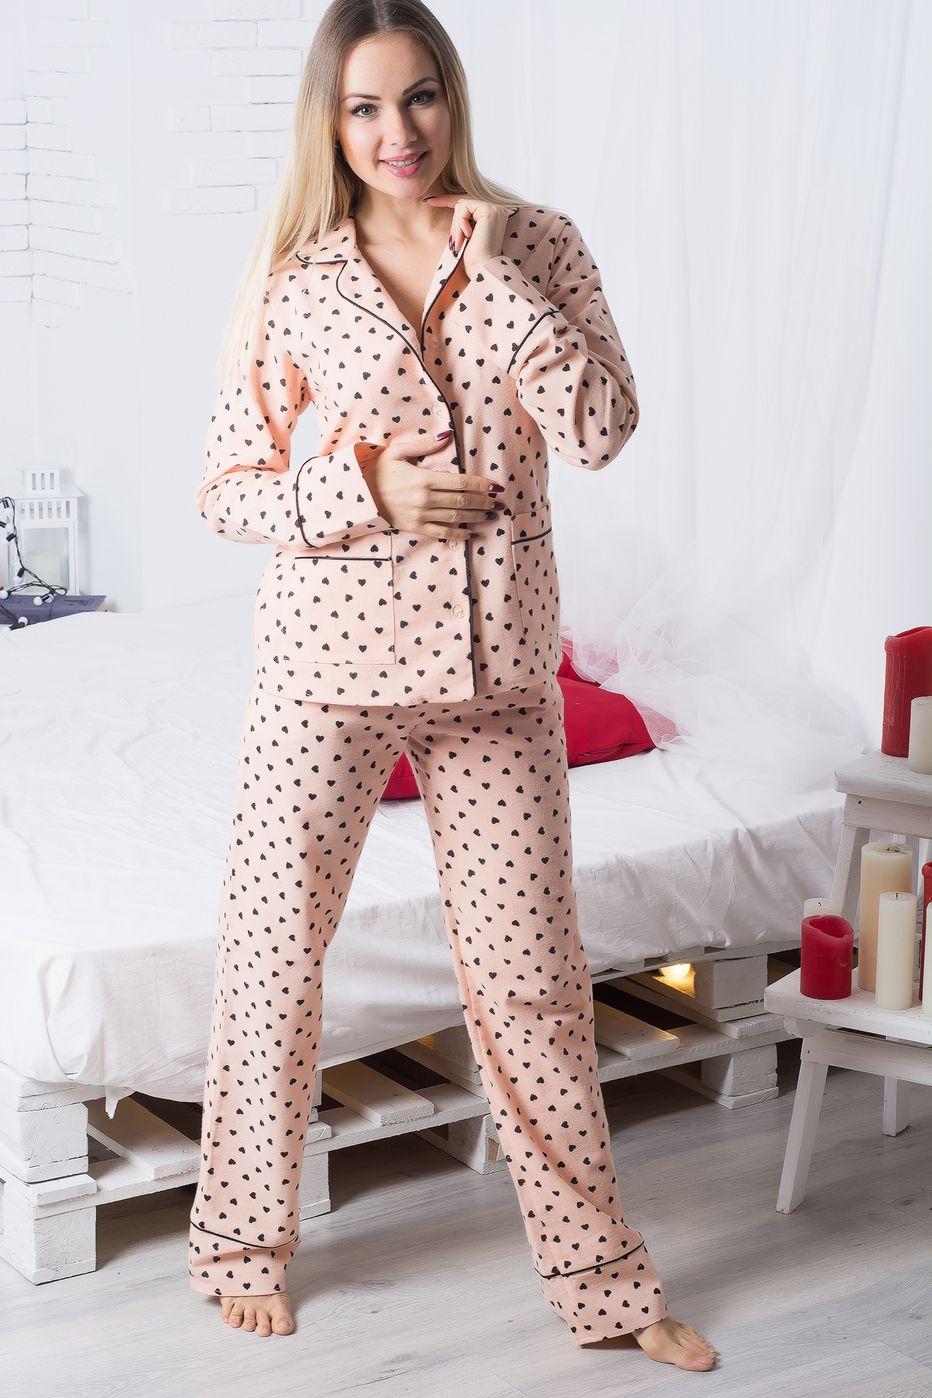 Пижама фланелевая П704 Сердечки на персике - купить в интернет ... c544643fbfd60